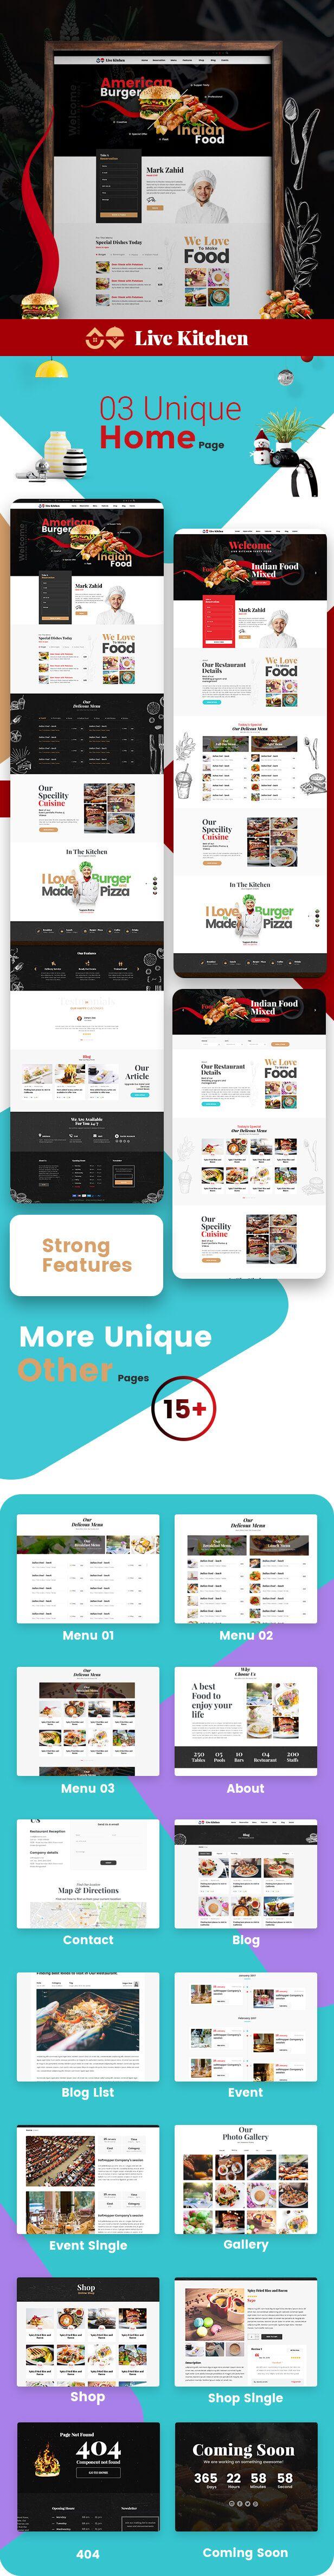 Livekitchen restaurant cafe wordpress theme web design